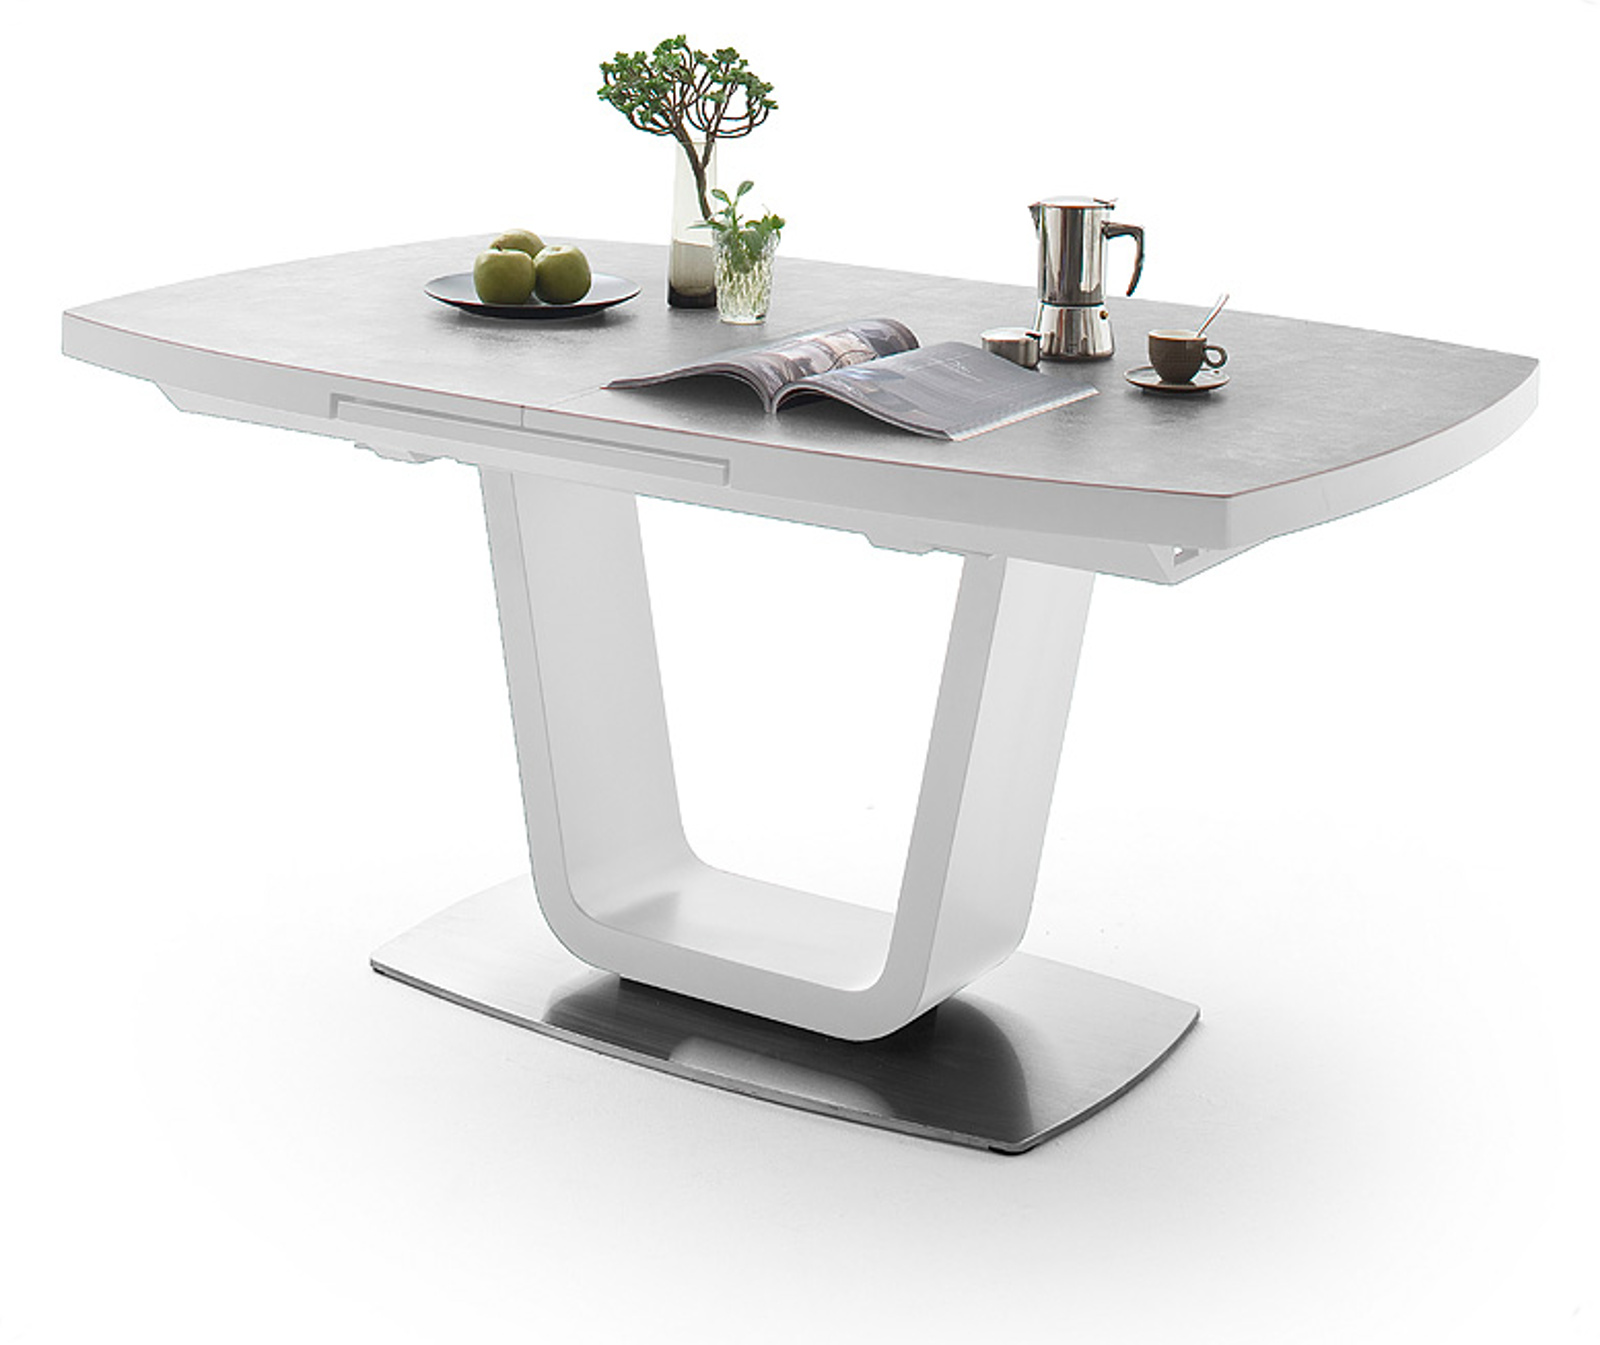 esstisch leandro wei lack keramik grau 140 cm. Black Bedroom Furniture Sets. Home Design Ideas